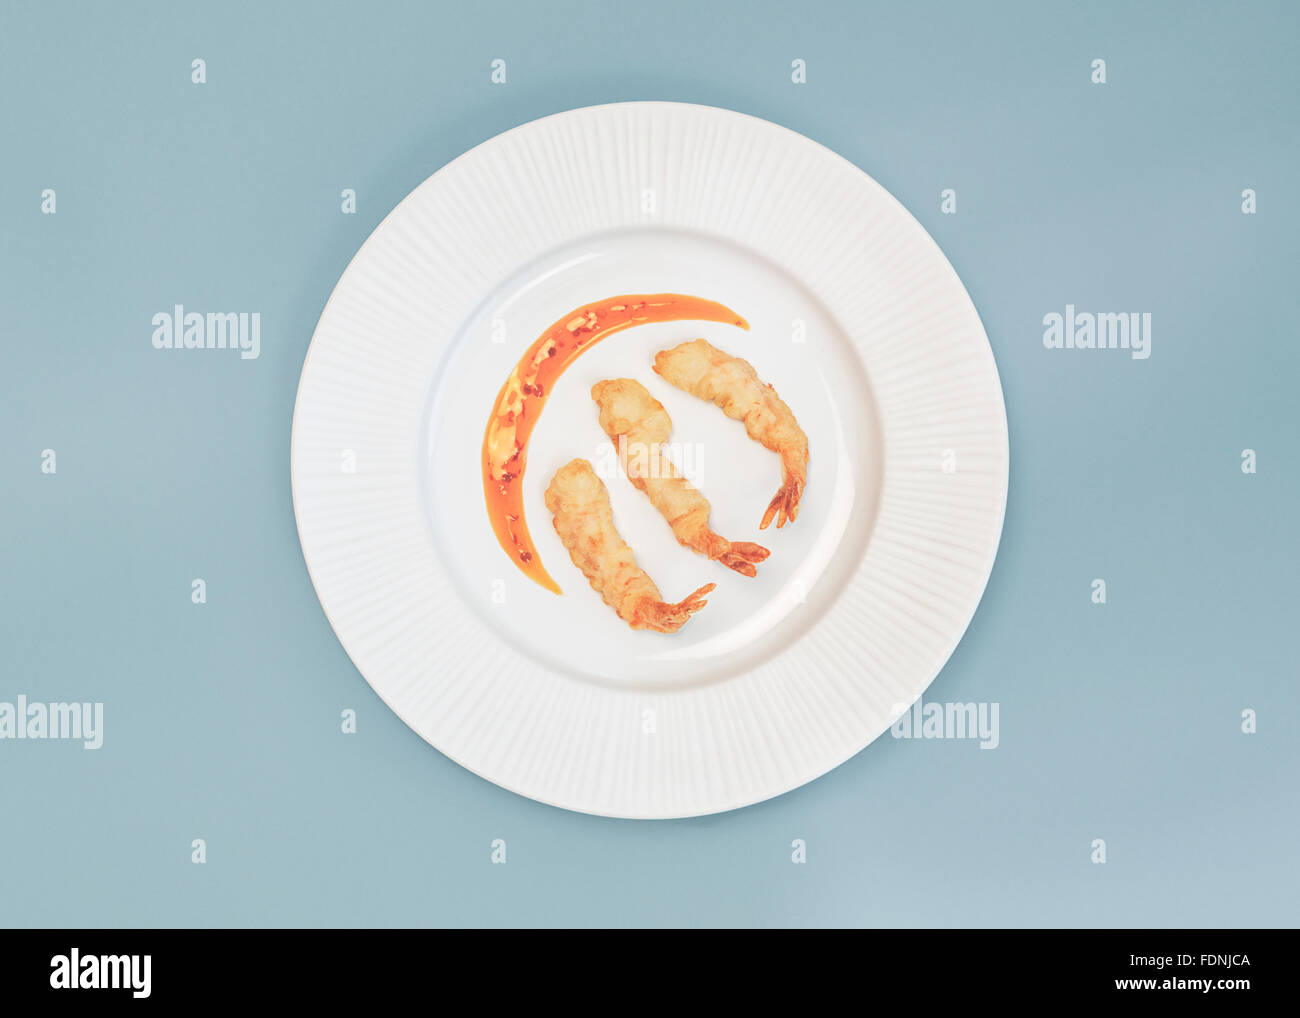 Tempura de langostinos en un plato con salsa de chili dulce Imagen De Stock